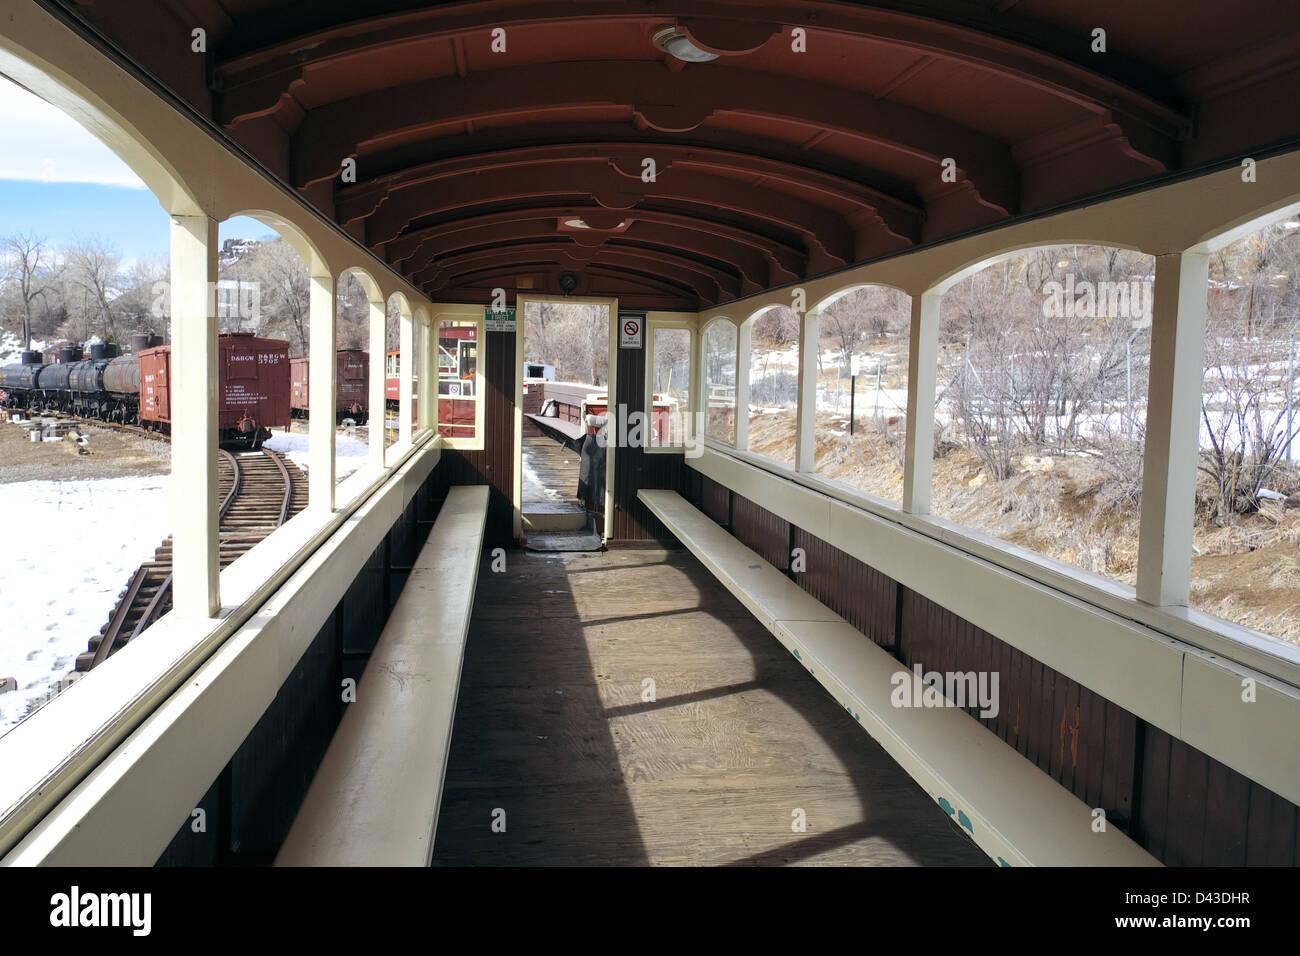 A passenger car at the Colorado Railroad Museum - Stock Image